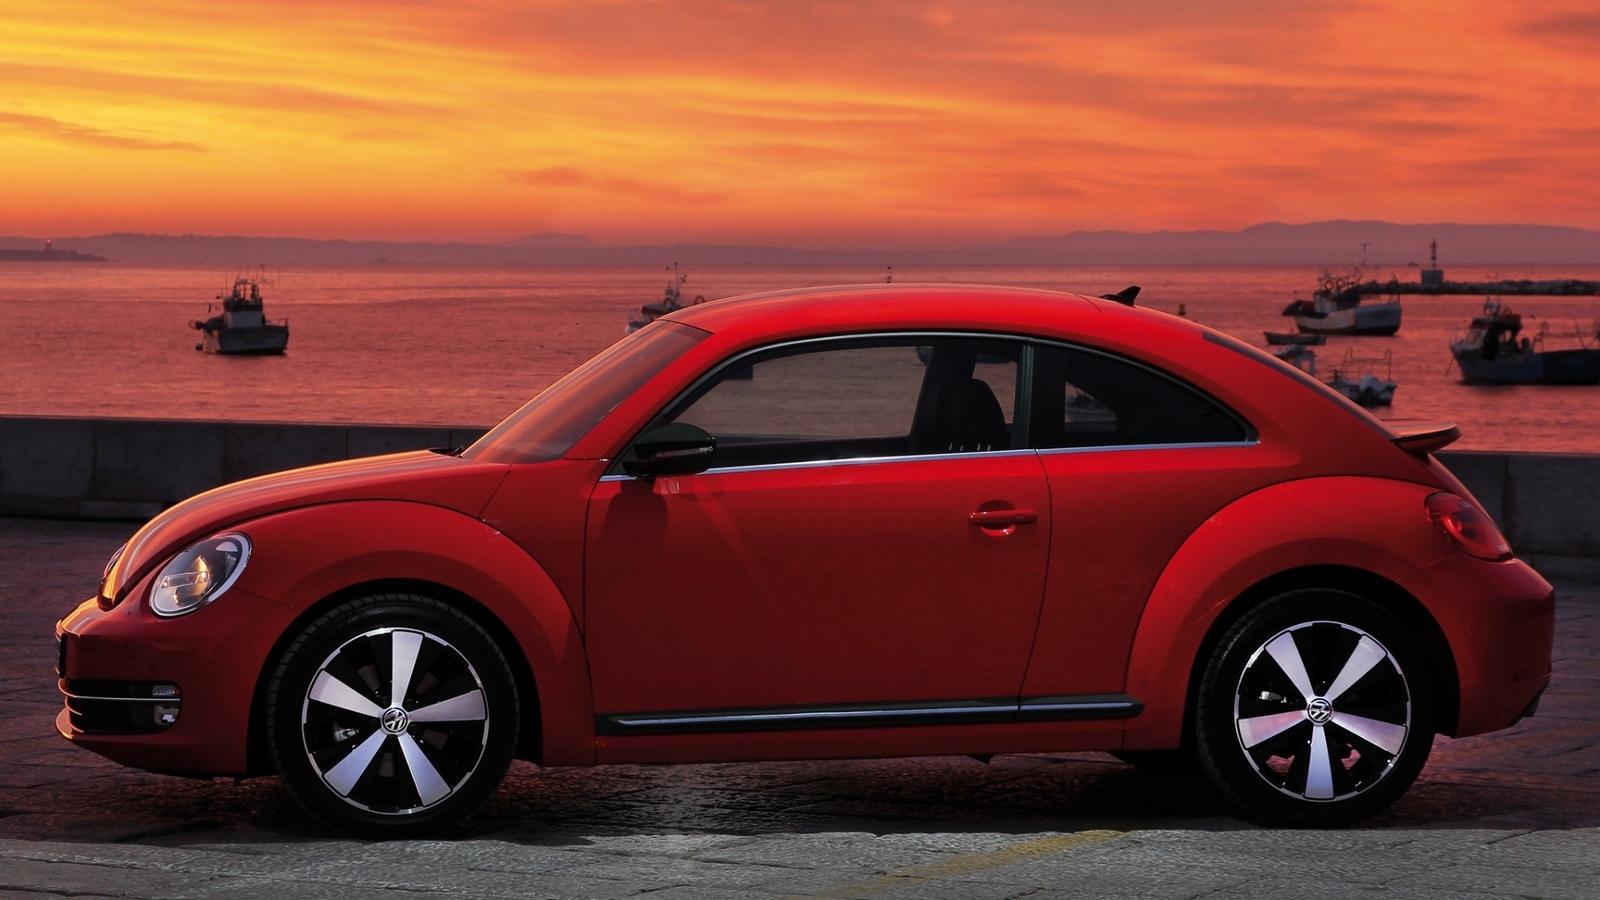 Download wallpaper 1600x900 volkswagen fusca red side view 1600x900